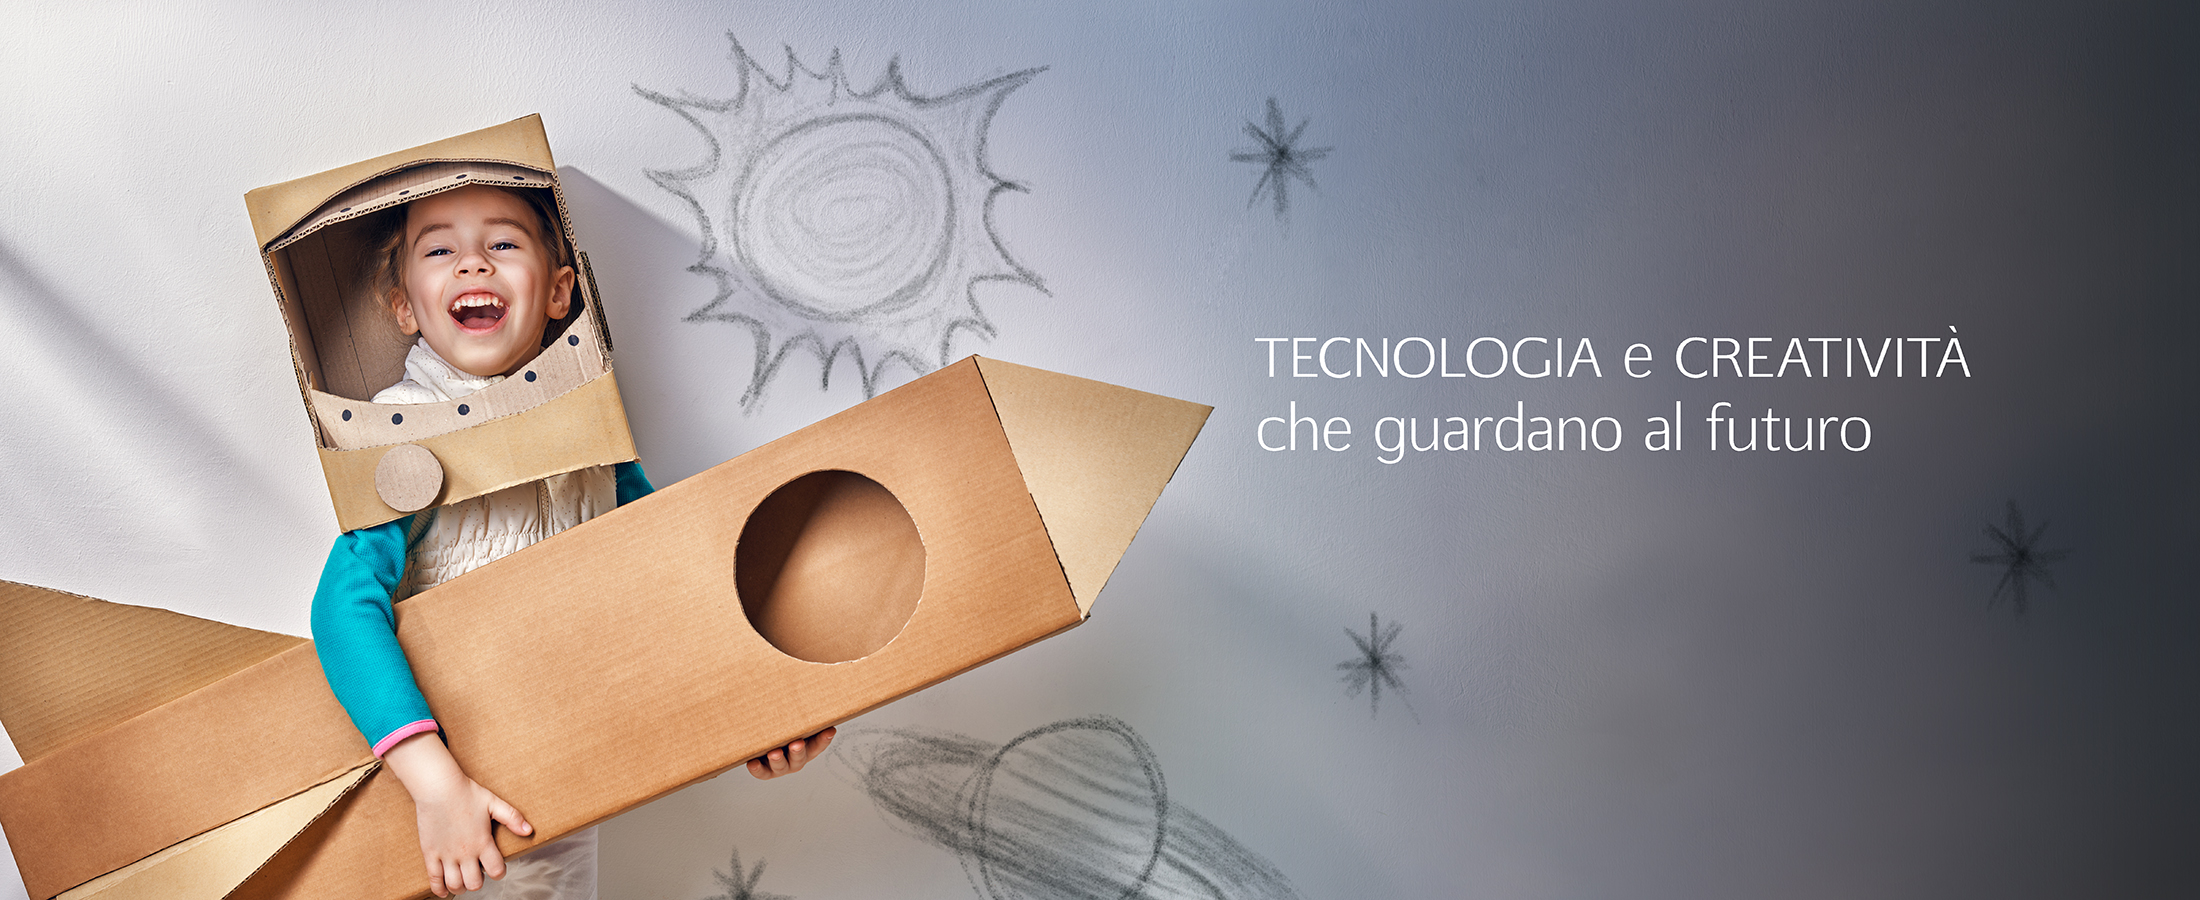 lampa_packaging_tecnologia_2200x900